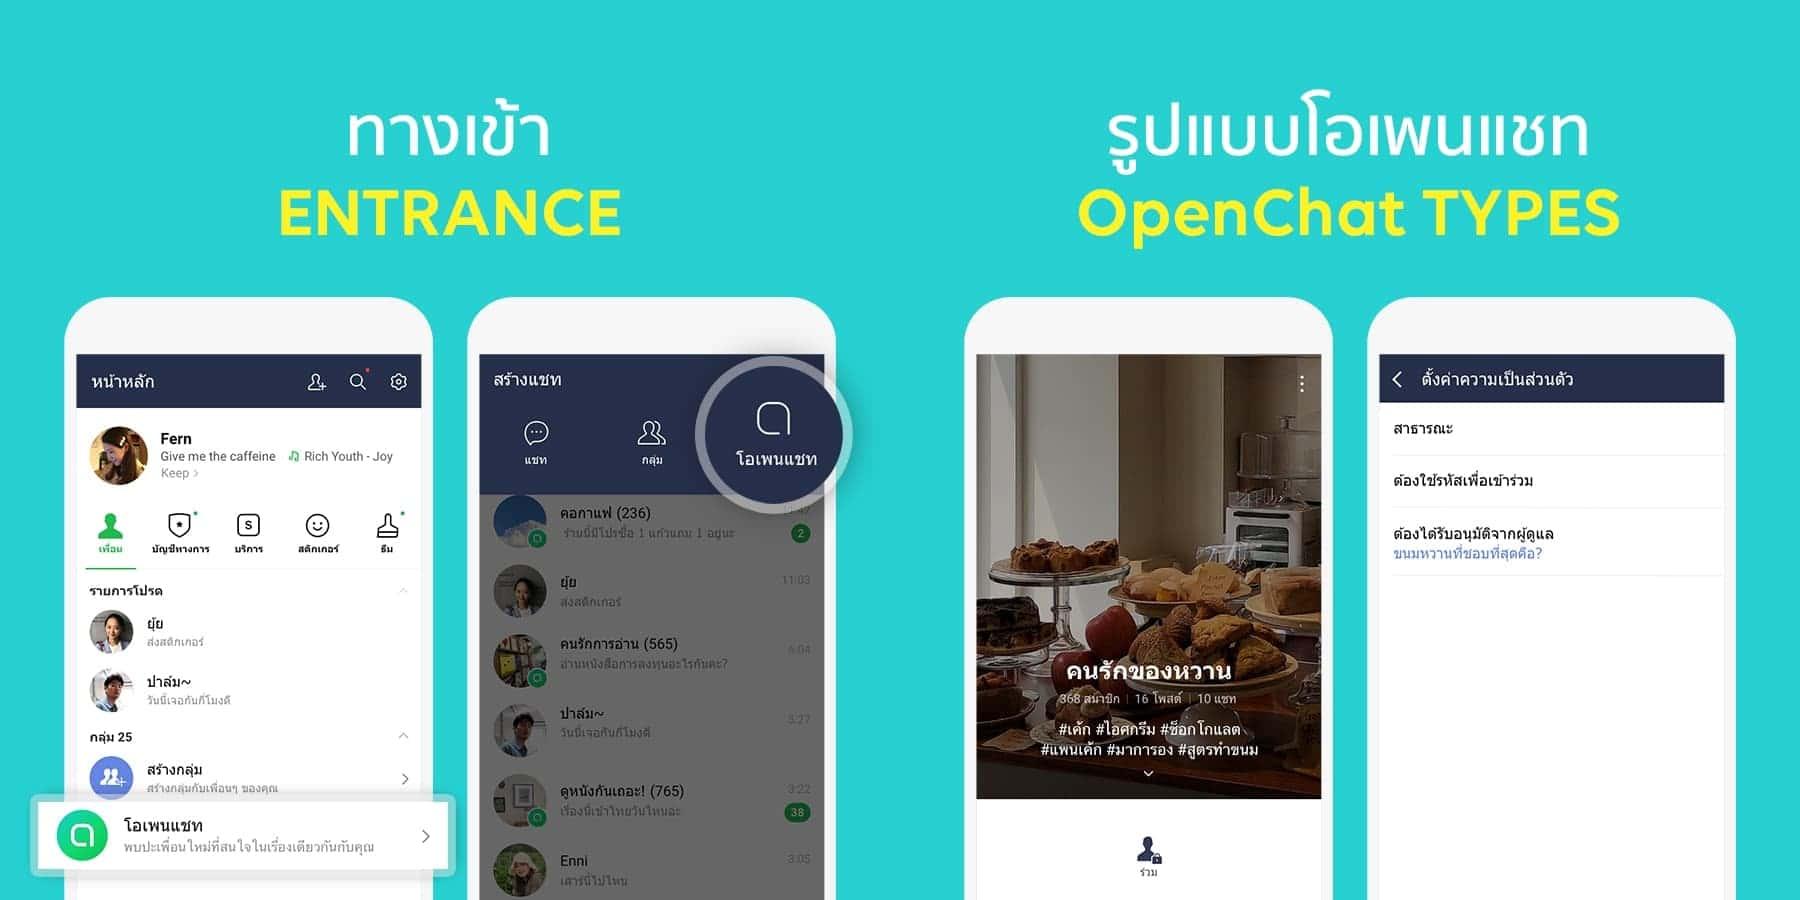 LINE Square ปรับโฉมใหม่เป็น LINE OpenChat มีอะไรเปลี่ยนแปลงบ้าง 2